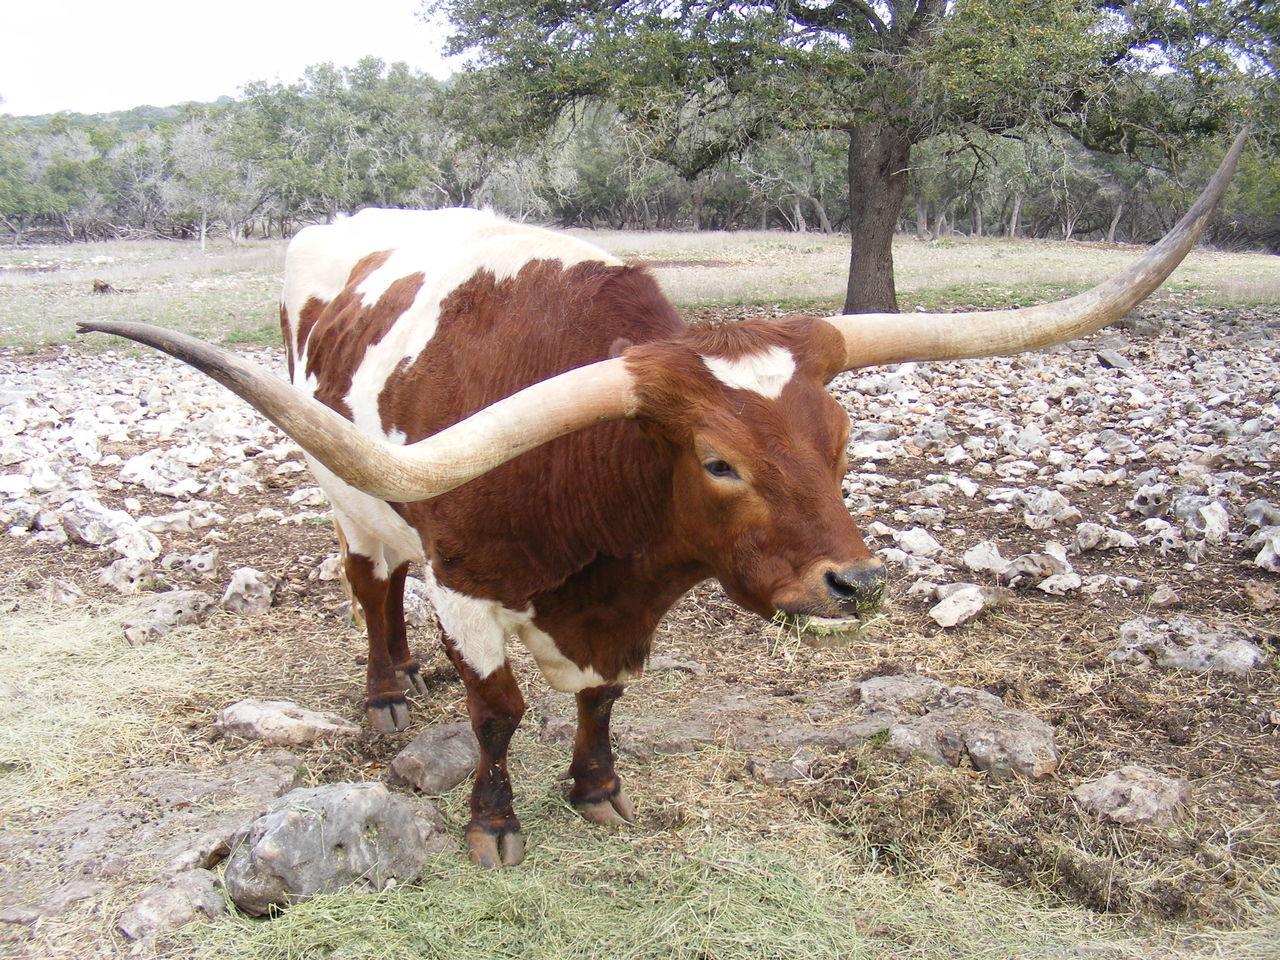 Beautiful stock photos of texas,  Animal,  Animal Themes,  Brown - Color,  Day